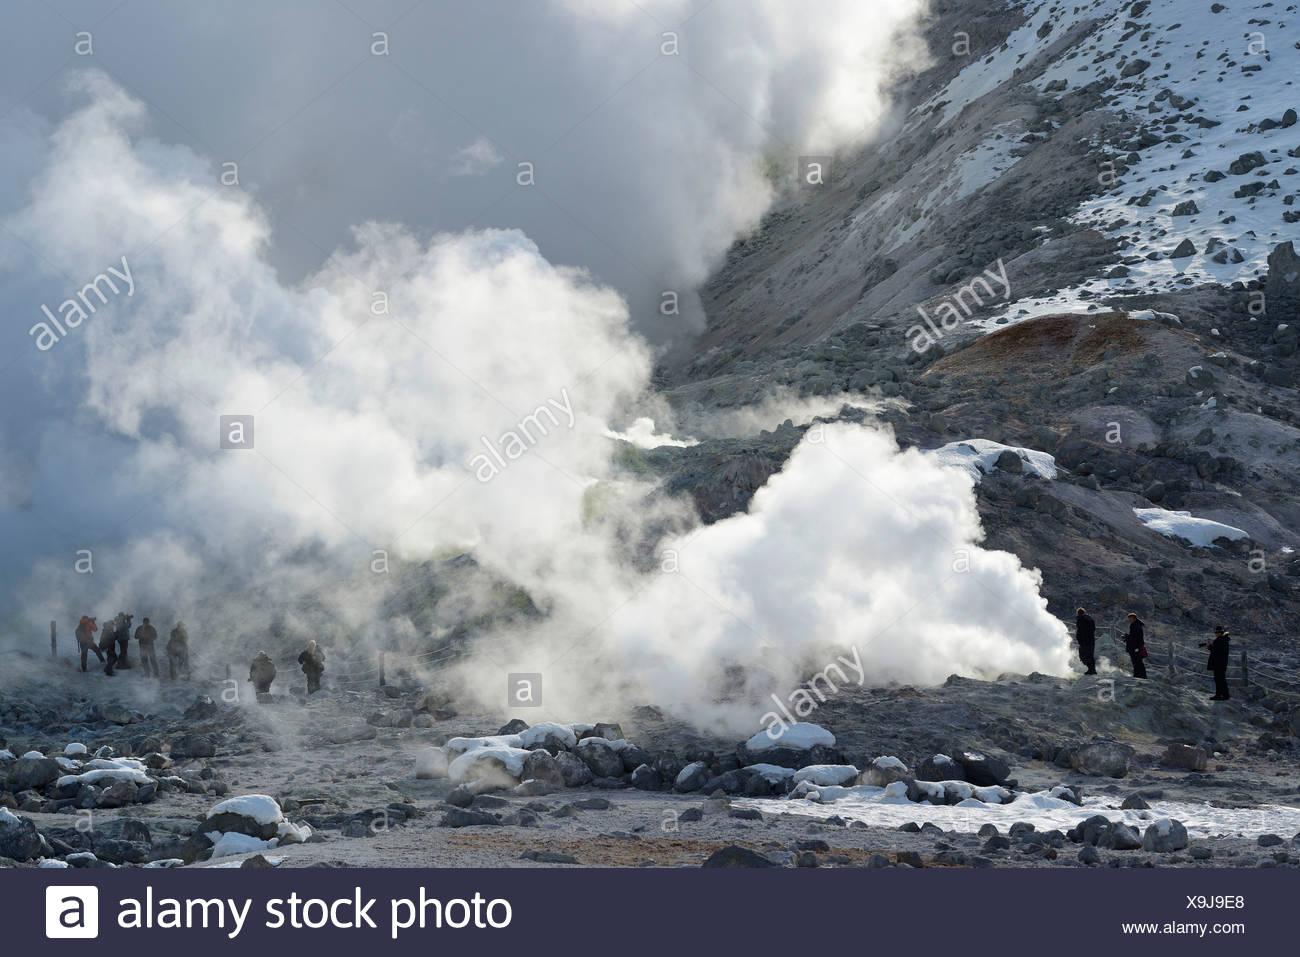 Tourists at the fumaroles, geothermal active region, Kawayu Onsen, Akan-Nationalpark, Hokkaido, Japan - Stock Image